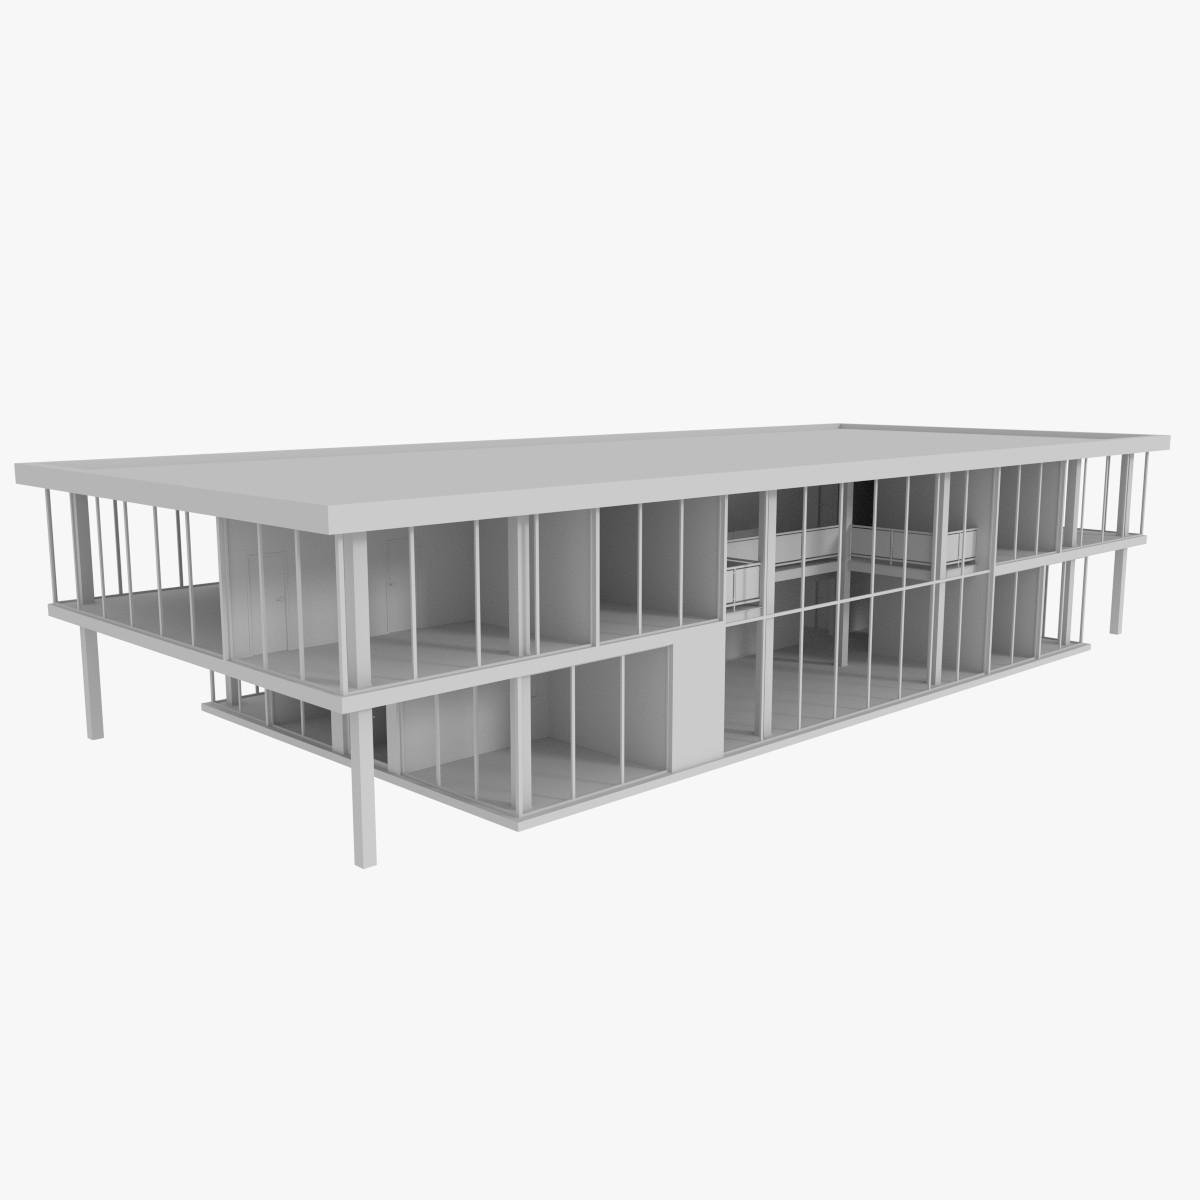 Modern office building interior exterior 3d obj for Modern office building exterior design